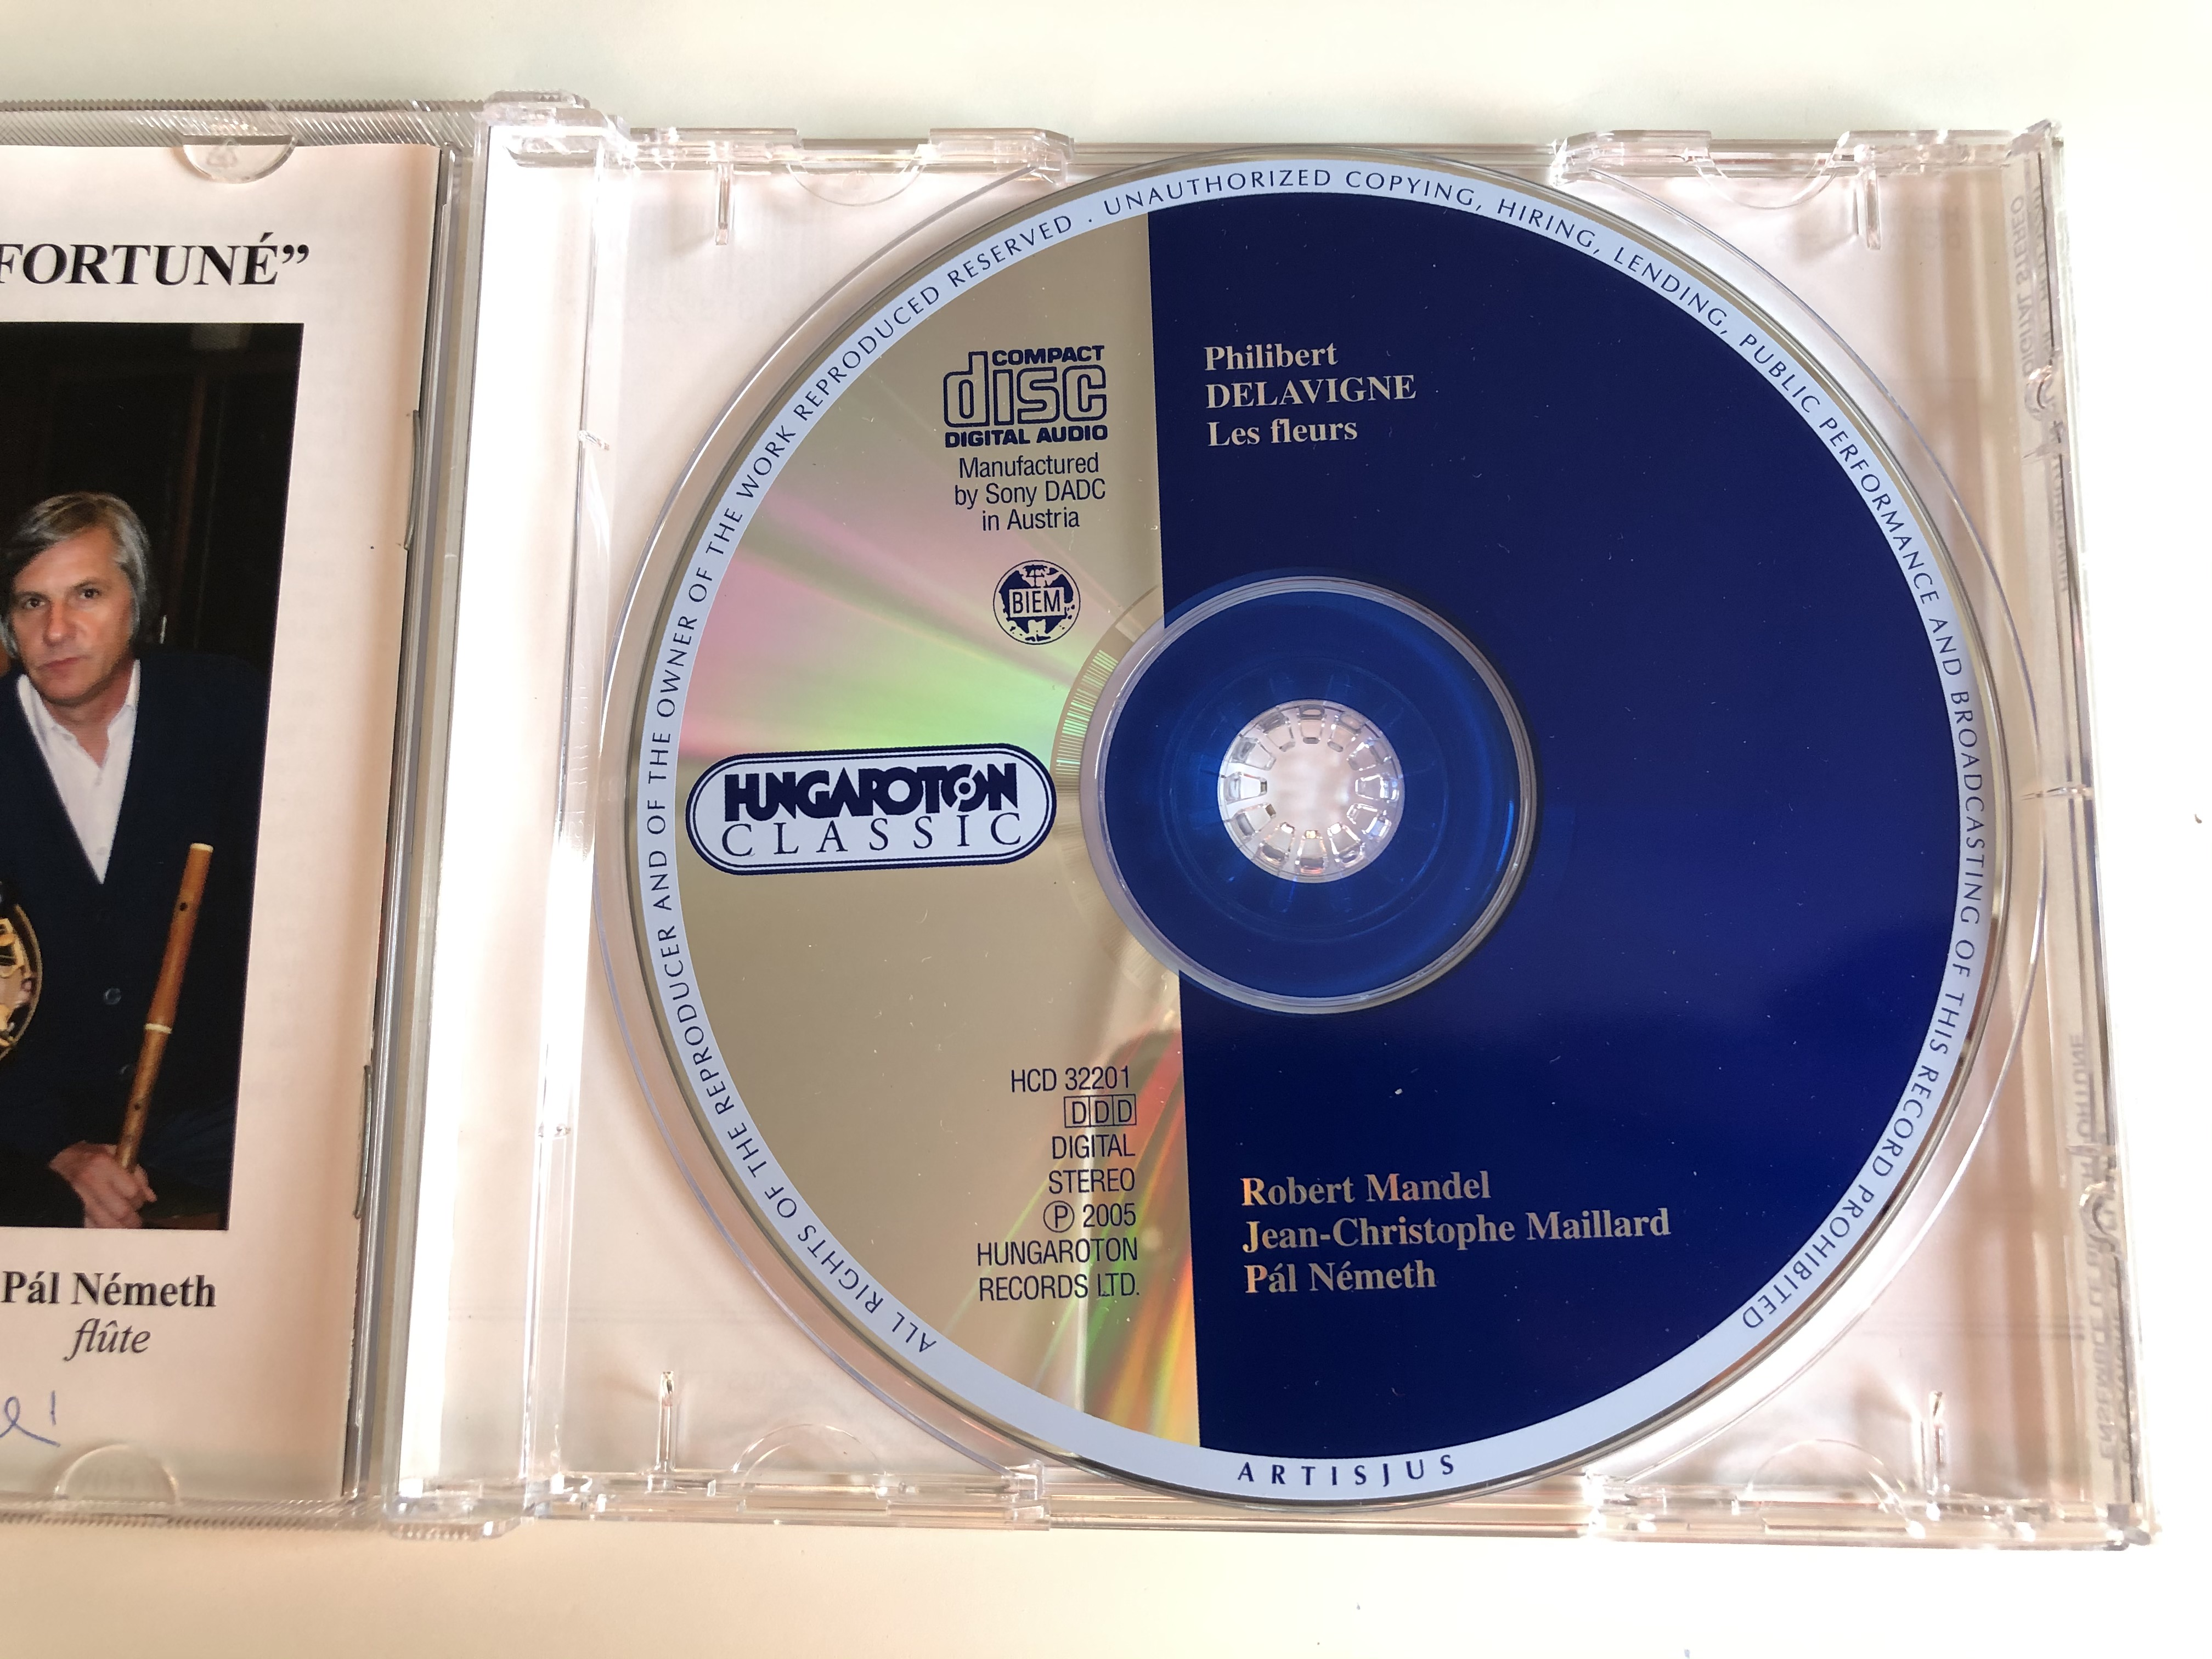 philibert-delavigne-les-fleurs-robert-mandel-jean-christophe-maillard-pal-nemeth-hungaroton-classic-audio-cd-2005-stereo-hcd-32201-7-.jpg